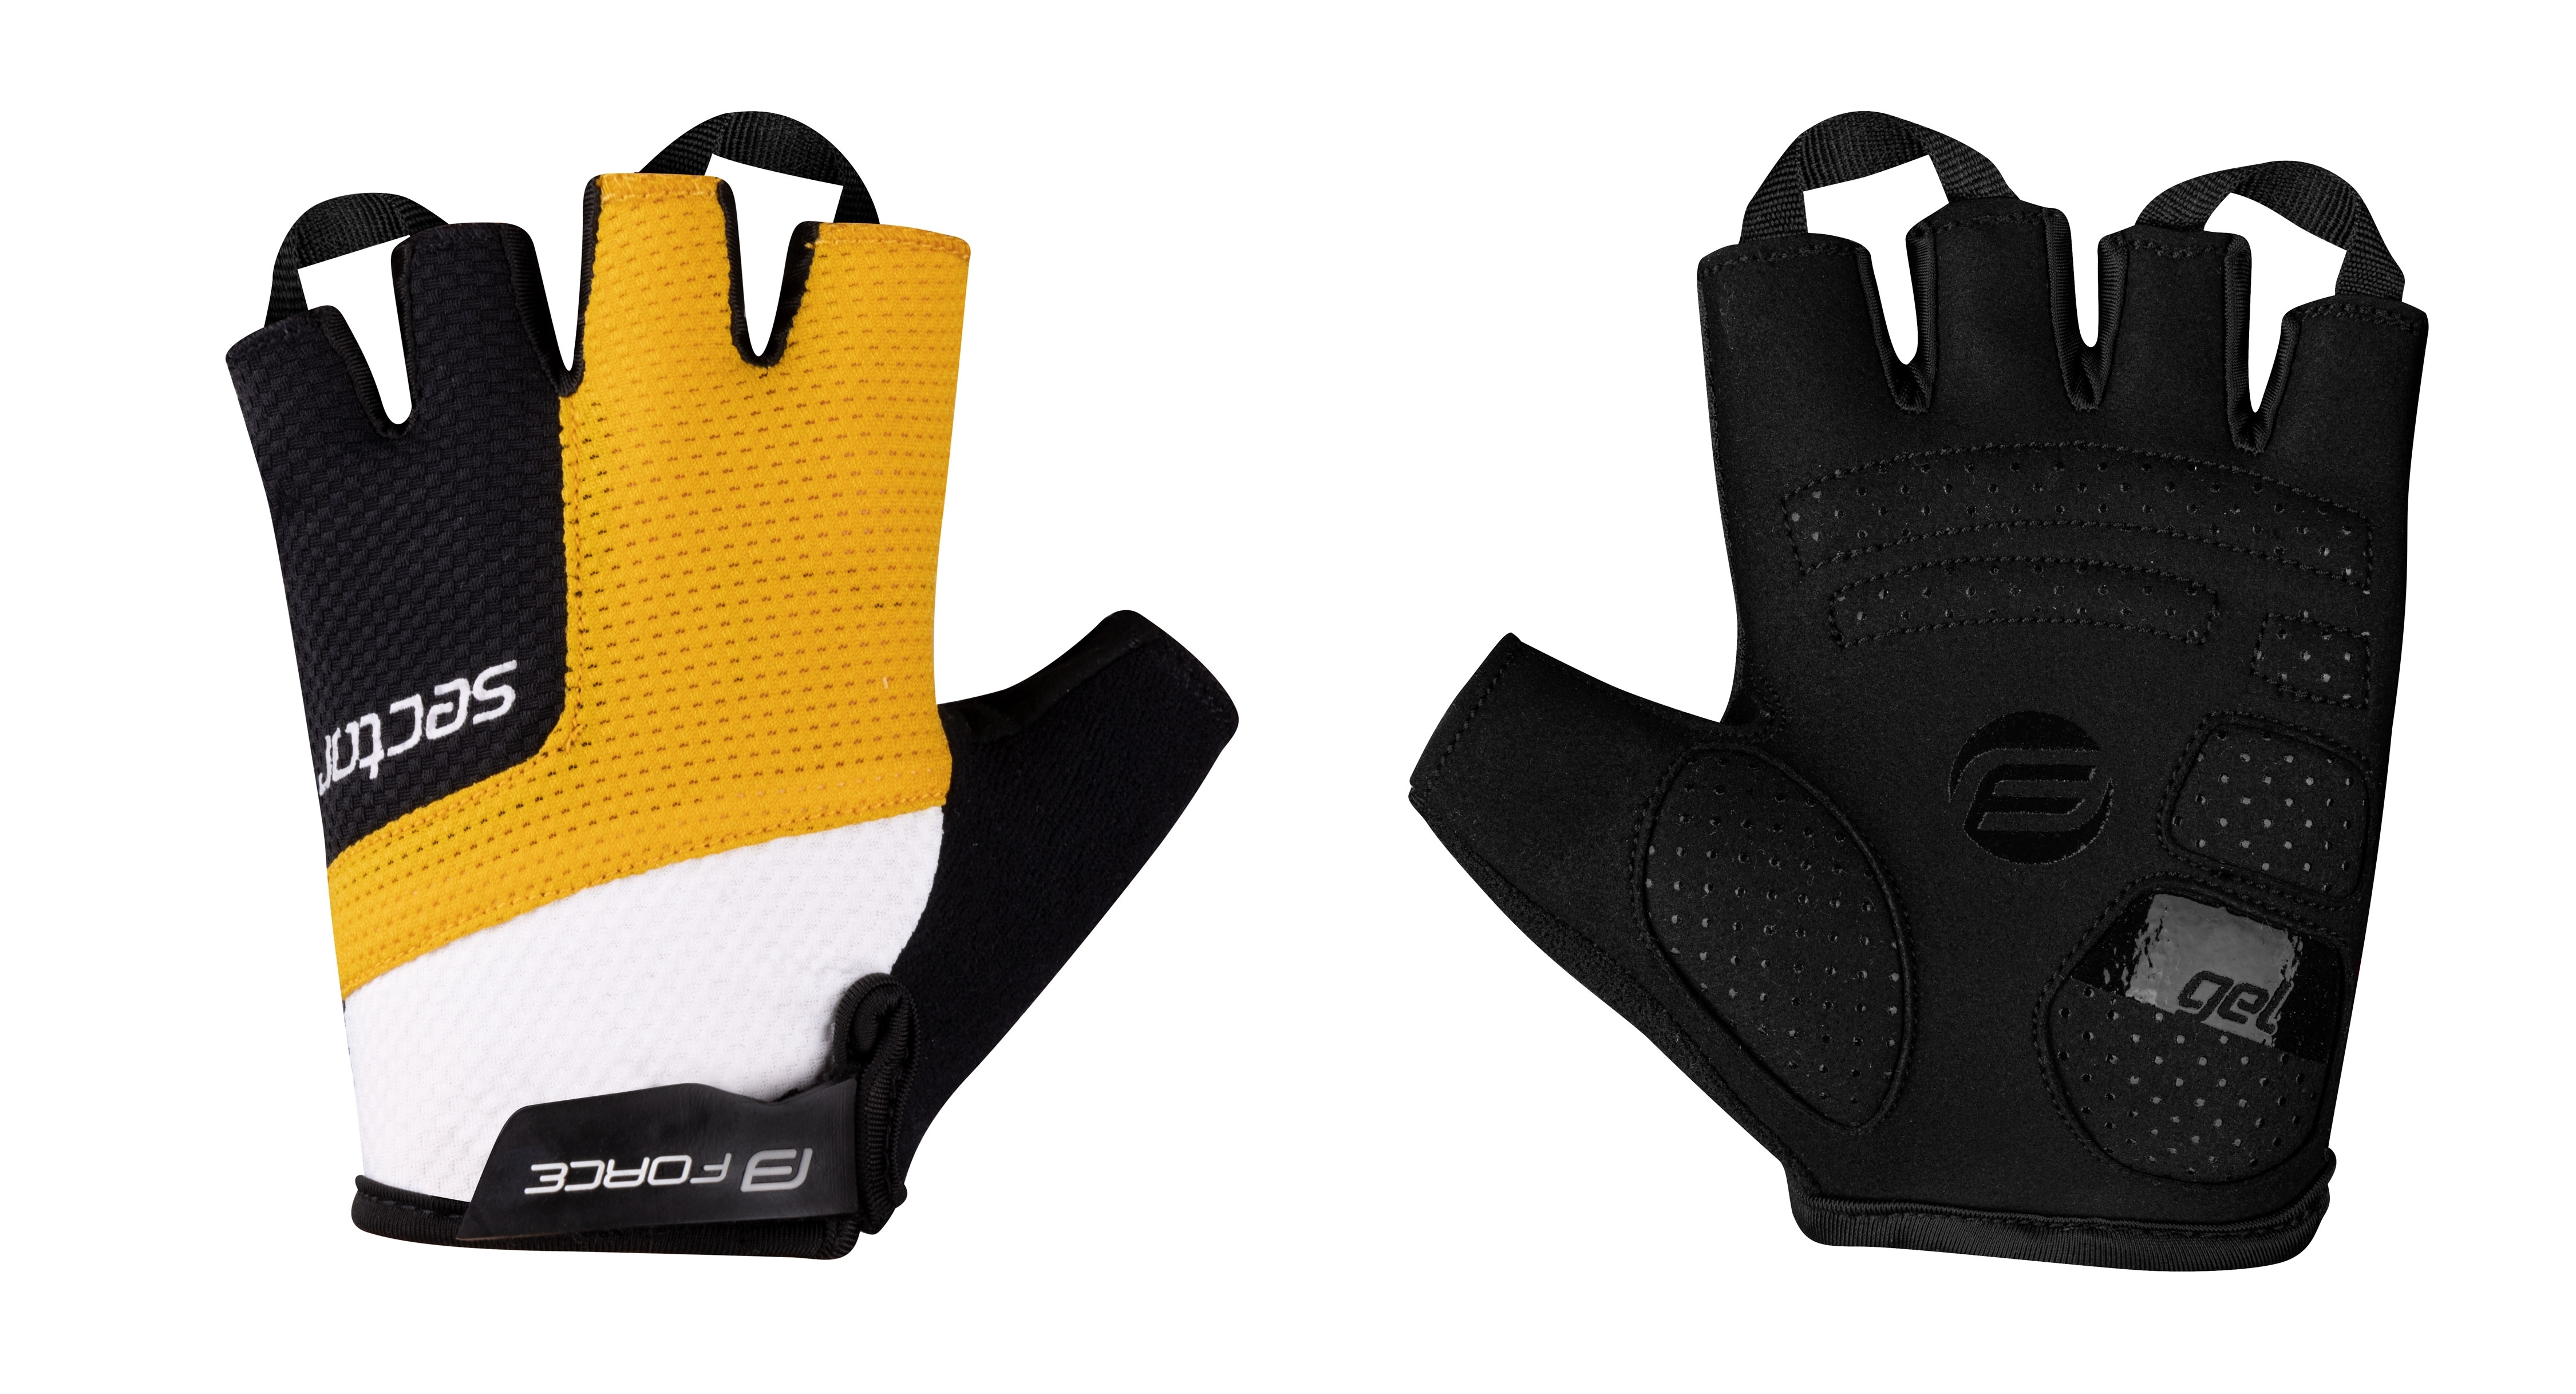 rukavice FORCE SECTOR gel, černo-žluté S